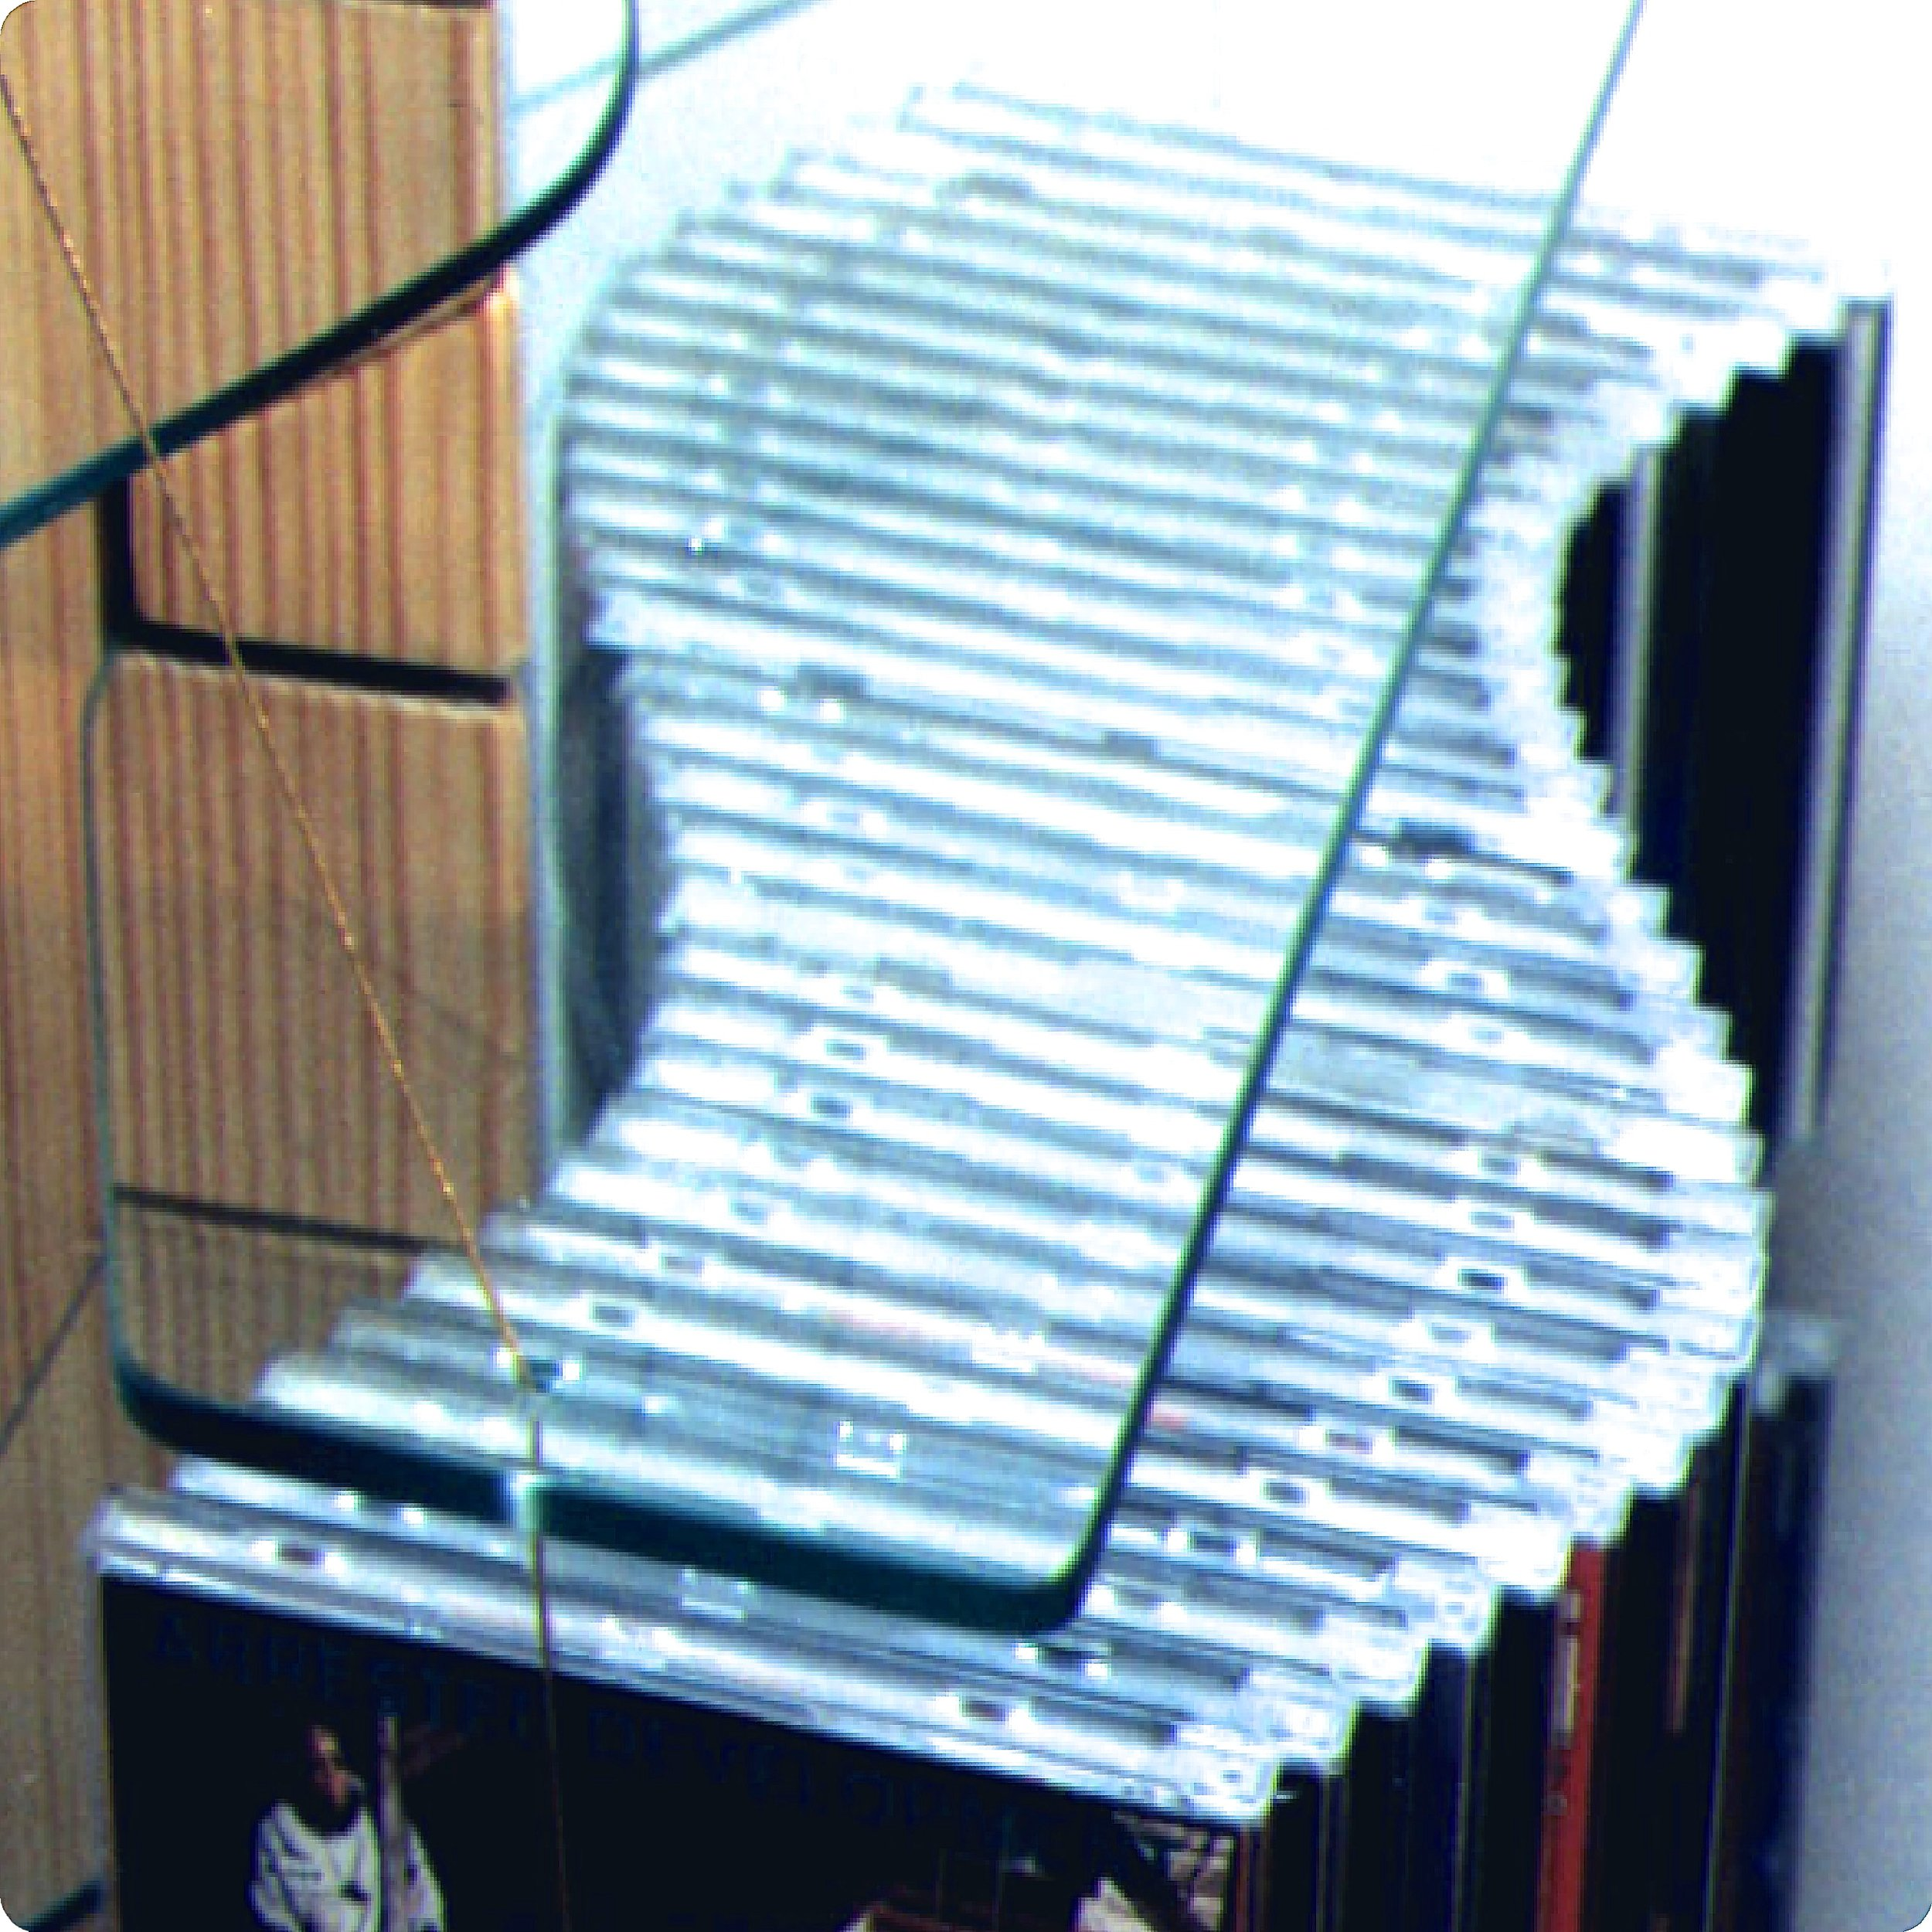 Wave CD Rack